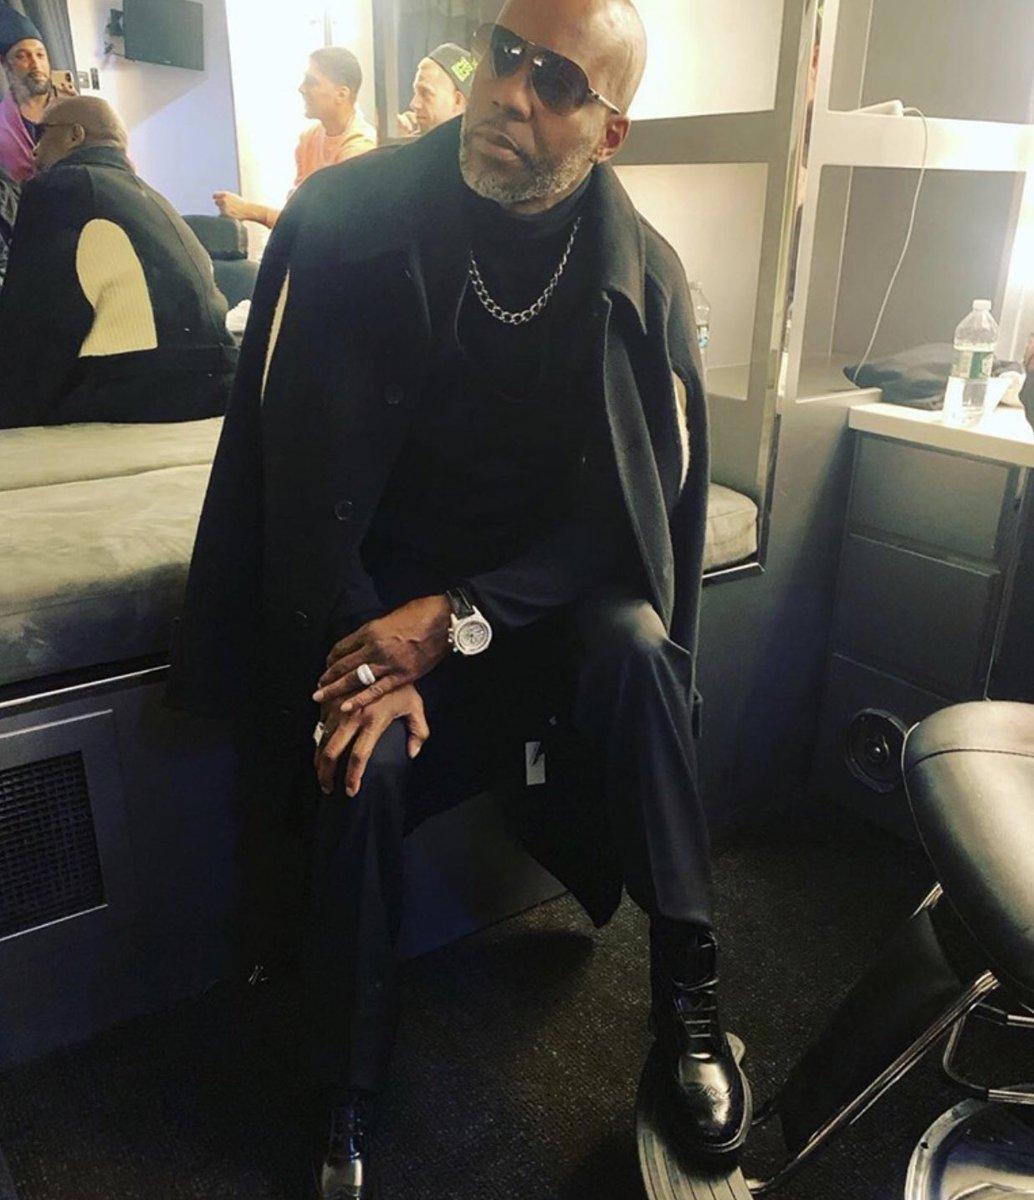 JUST CUZ I.... love my niggas... I SHARE BLOOD..for my niggas #dmxchallange <br>http://pic.twitter.com/V4LDTMmguv